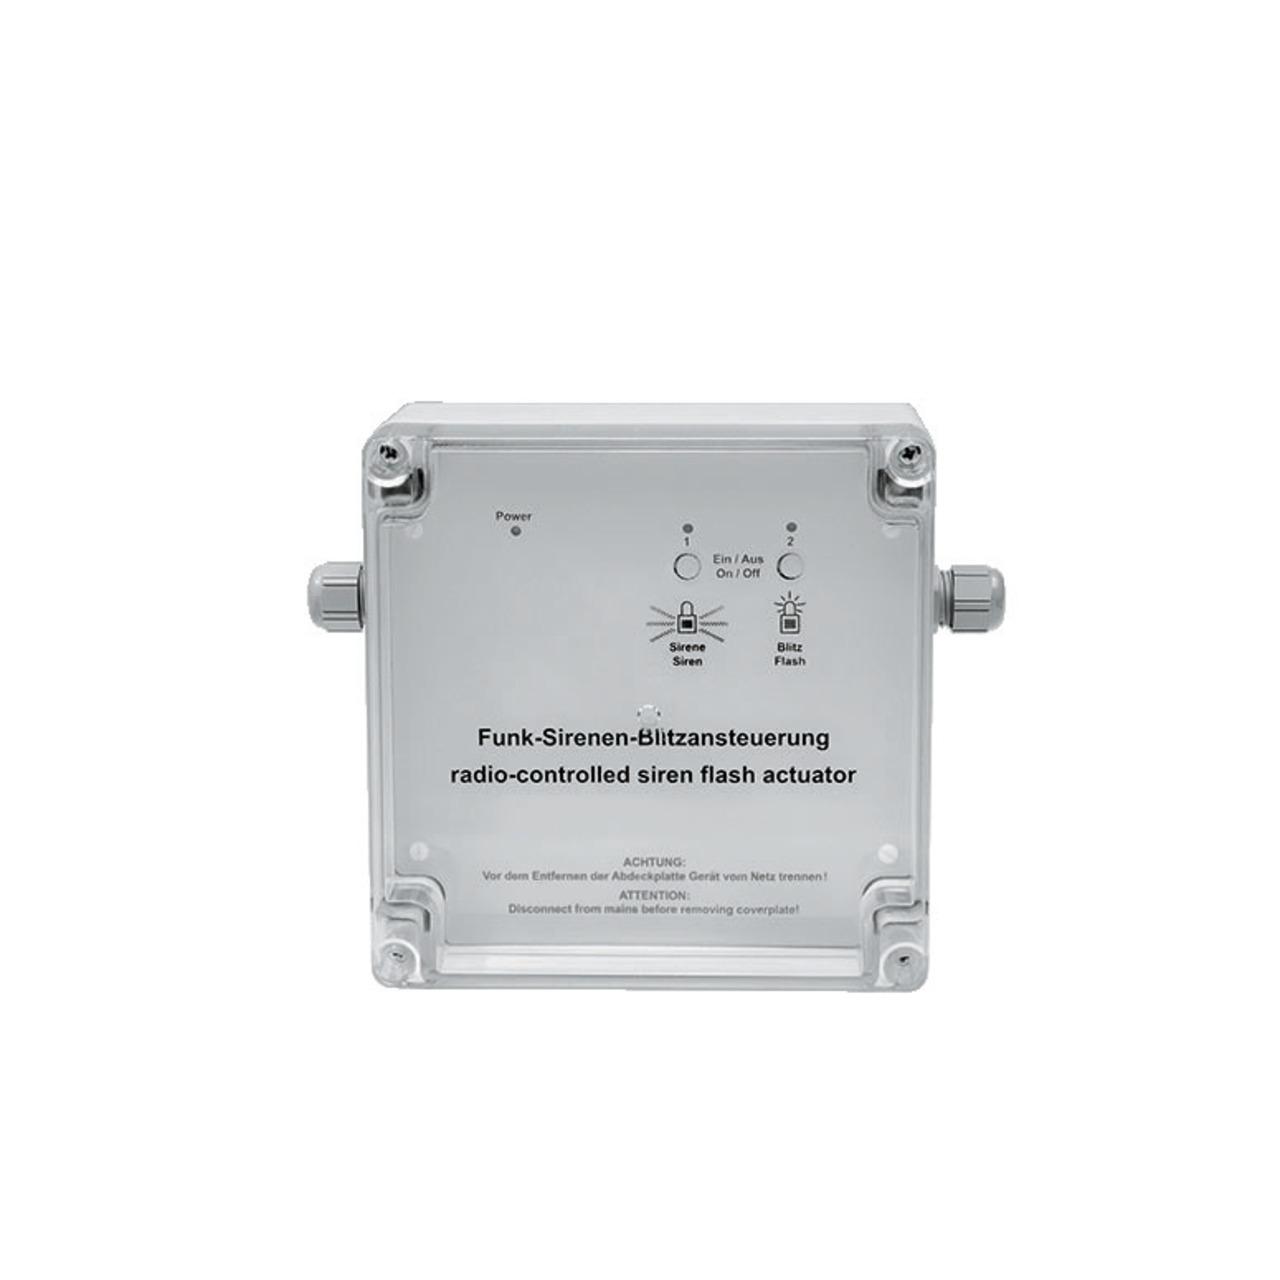 Homematic Funk-Sirenenansteuerung HM-Sec-SFA-SM für Smart Home / Hausautomation